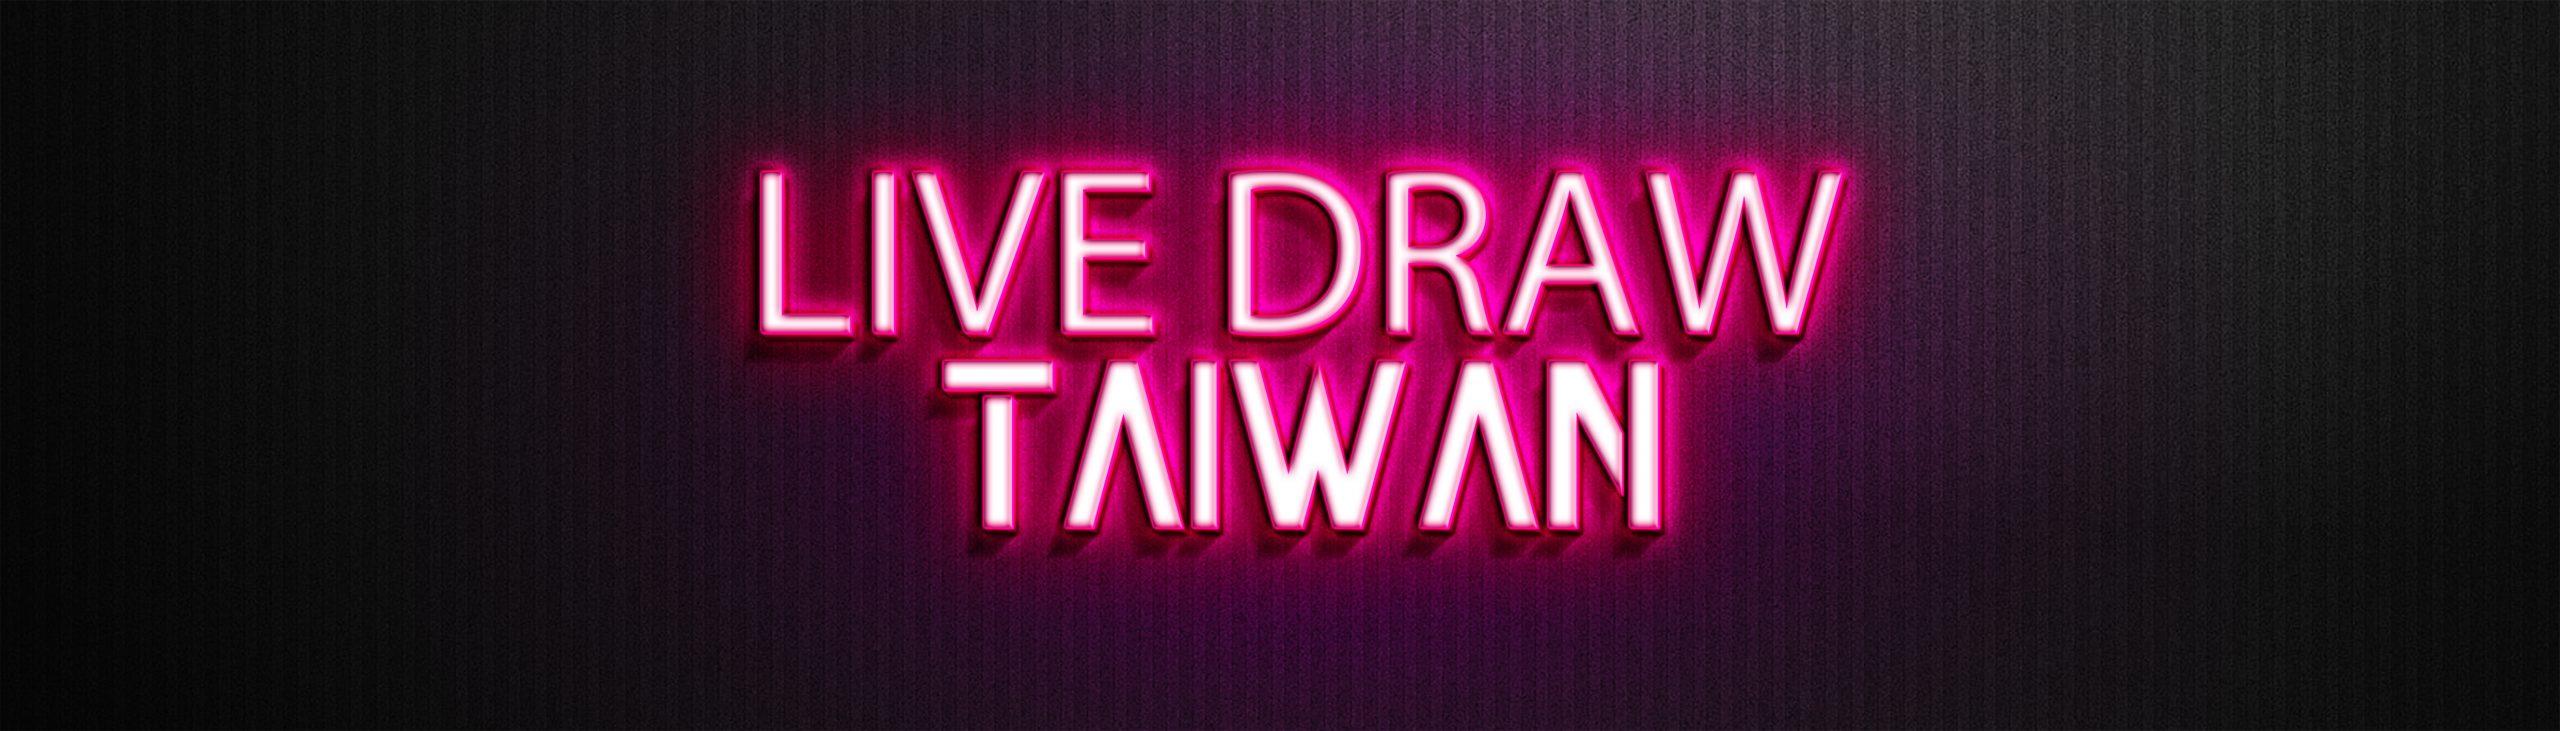 Live Draw Taiwan Hari Ini Tercepat